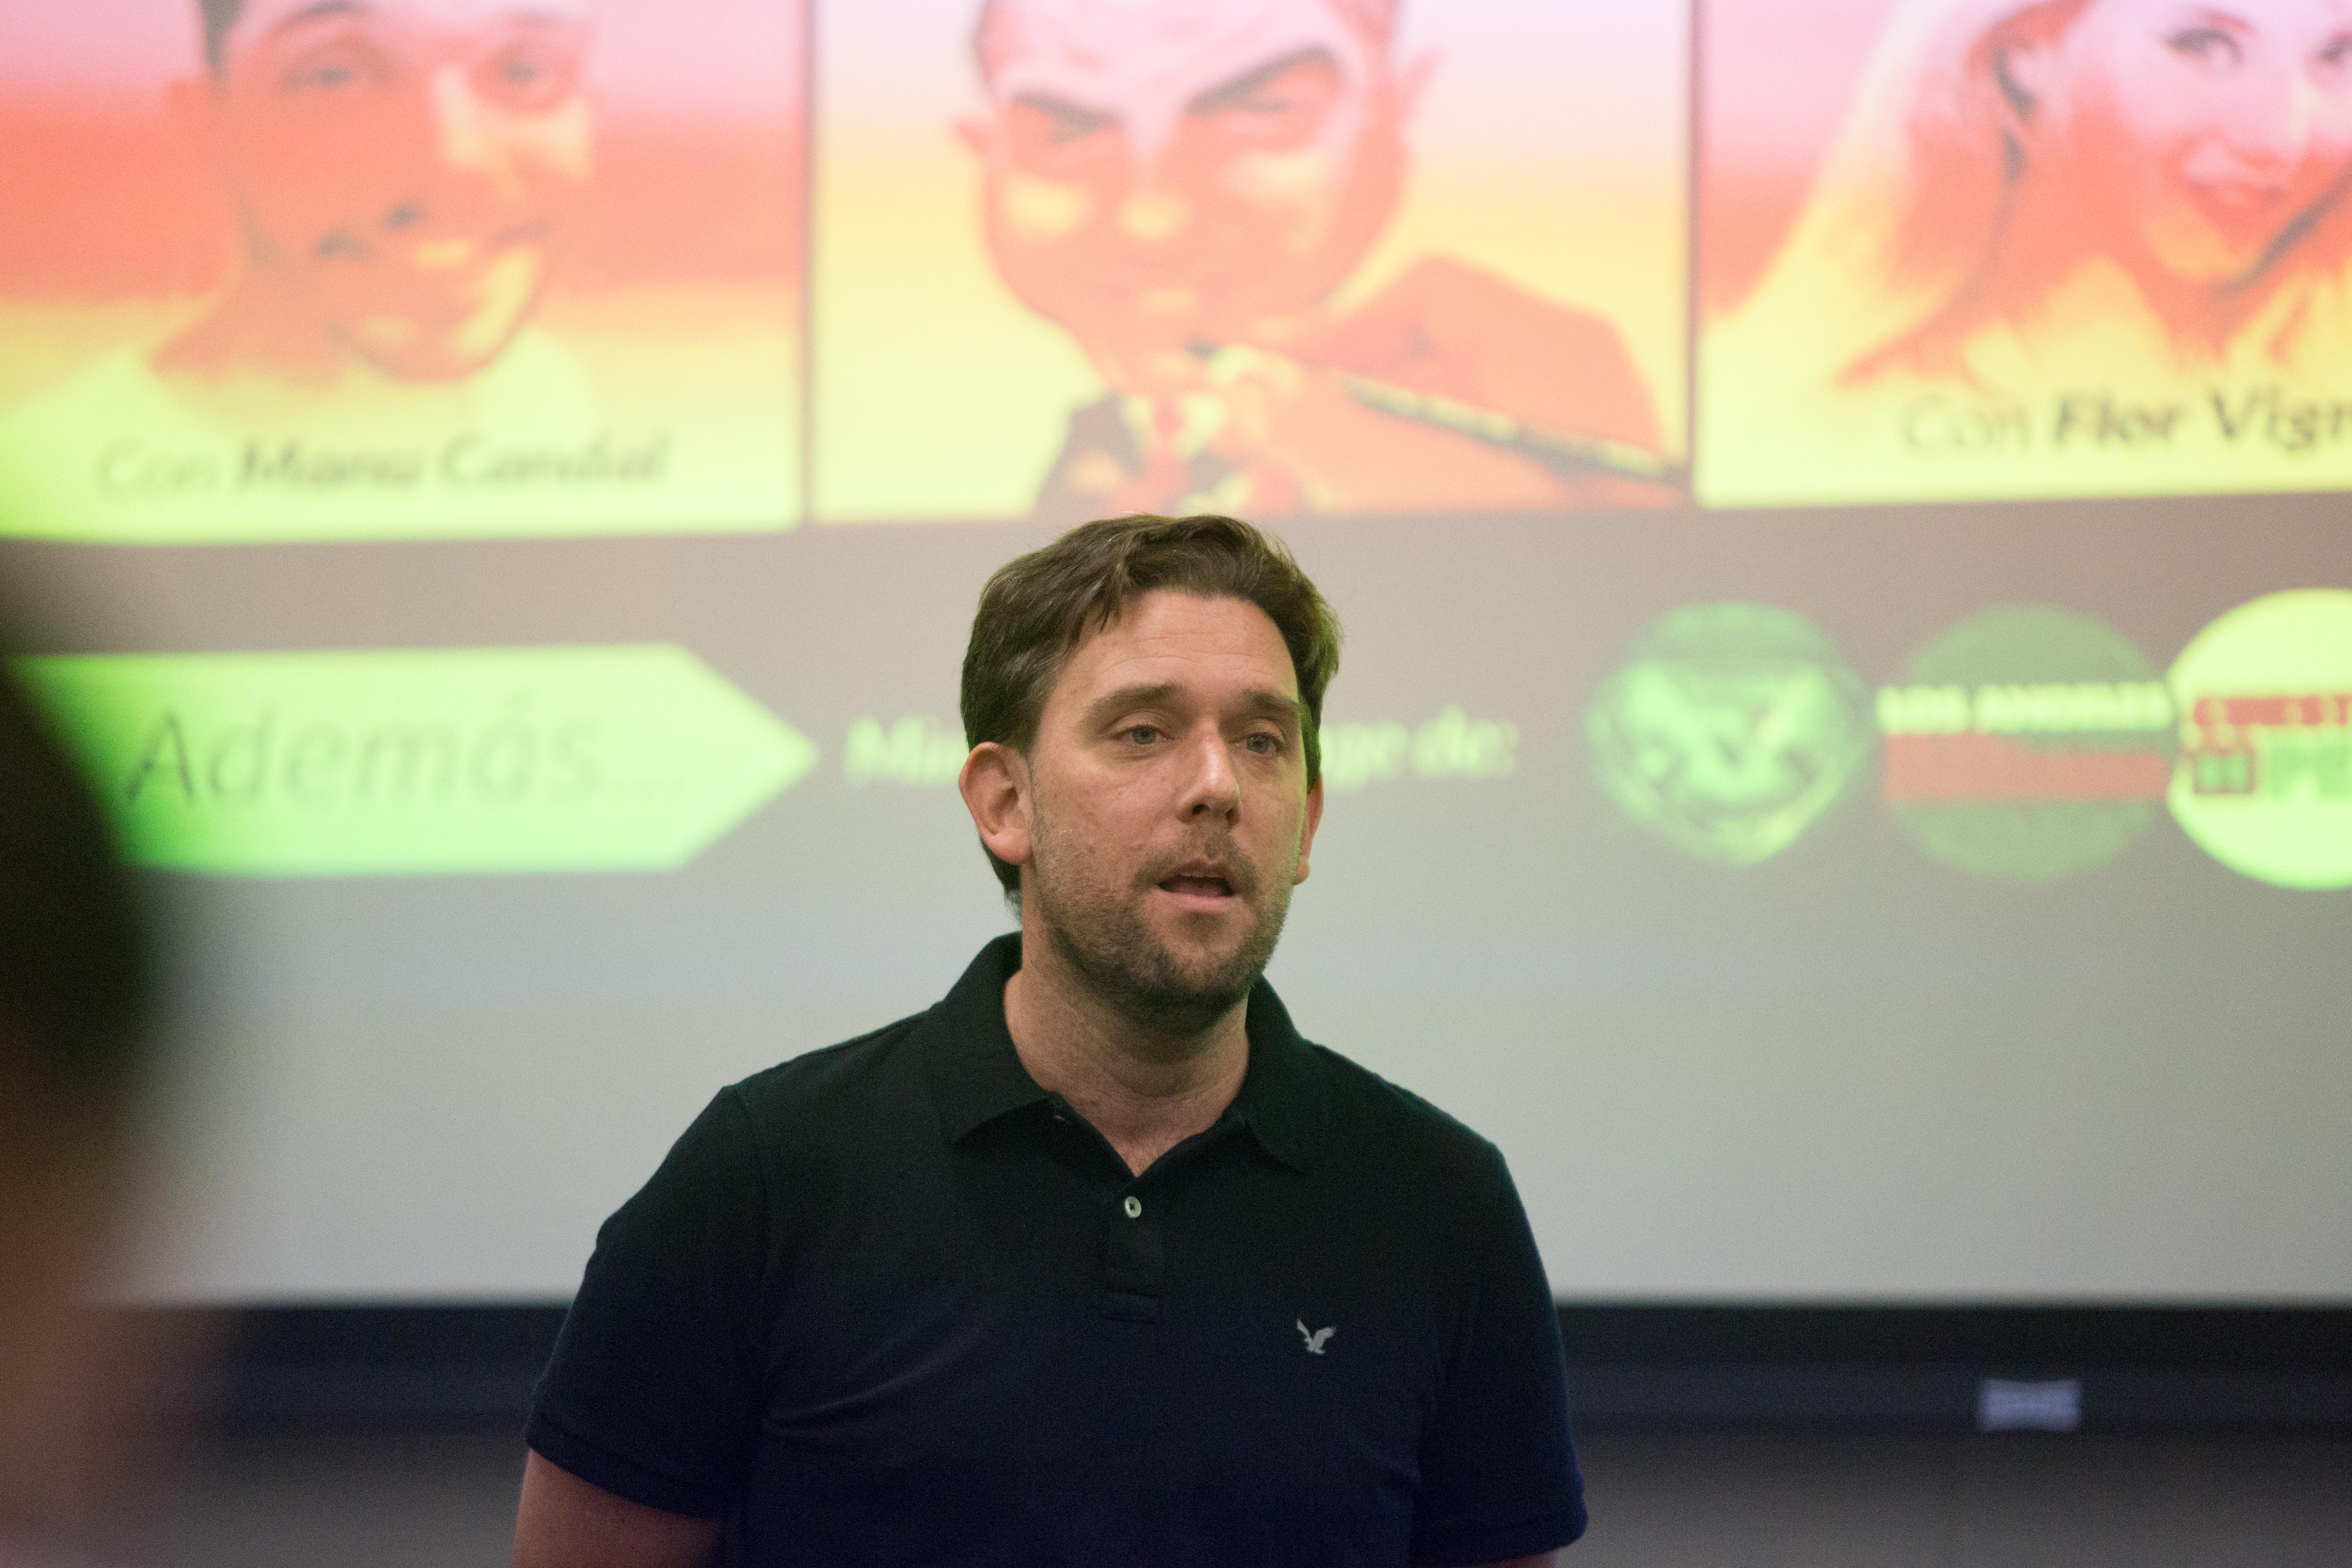 Agustín D'Empaire, gerente de plataformas digitales de ElTrece de Argentina, habló sobre la estrategia de redes sociales del canal. (Mary Kang/Knight Center)